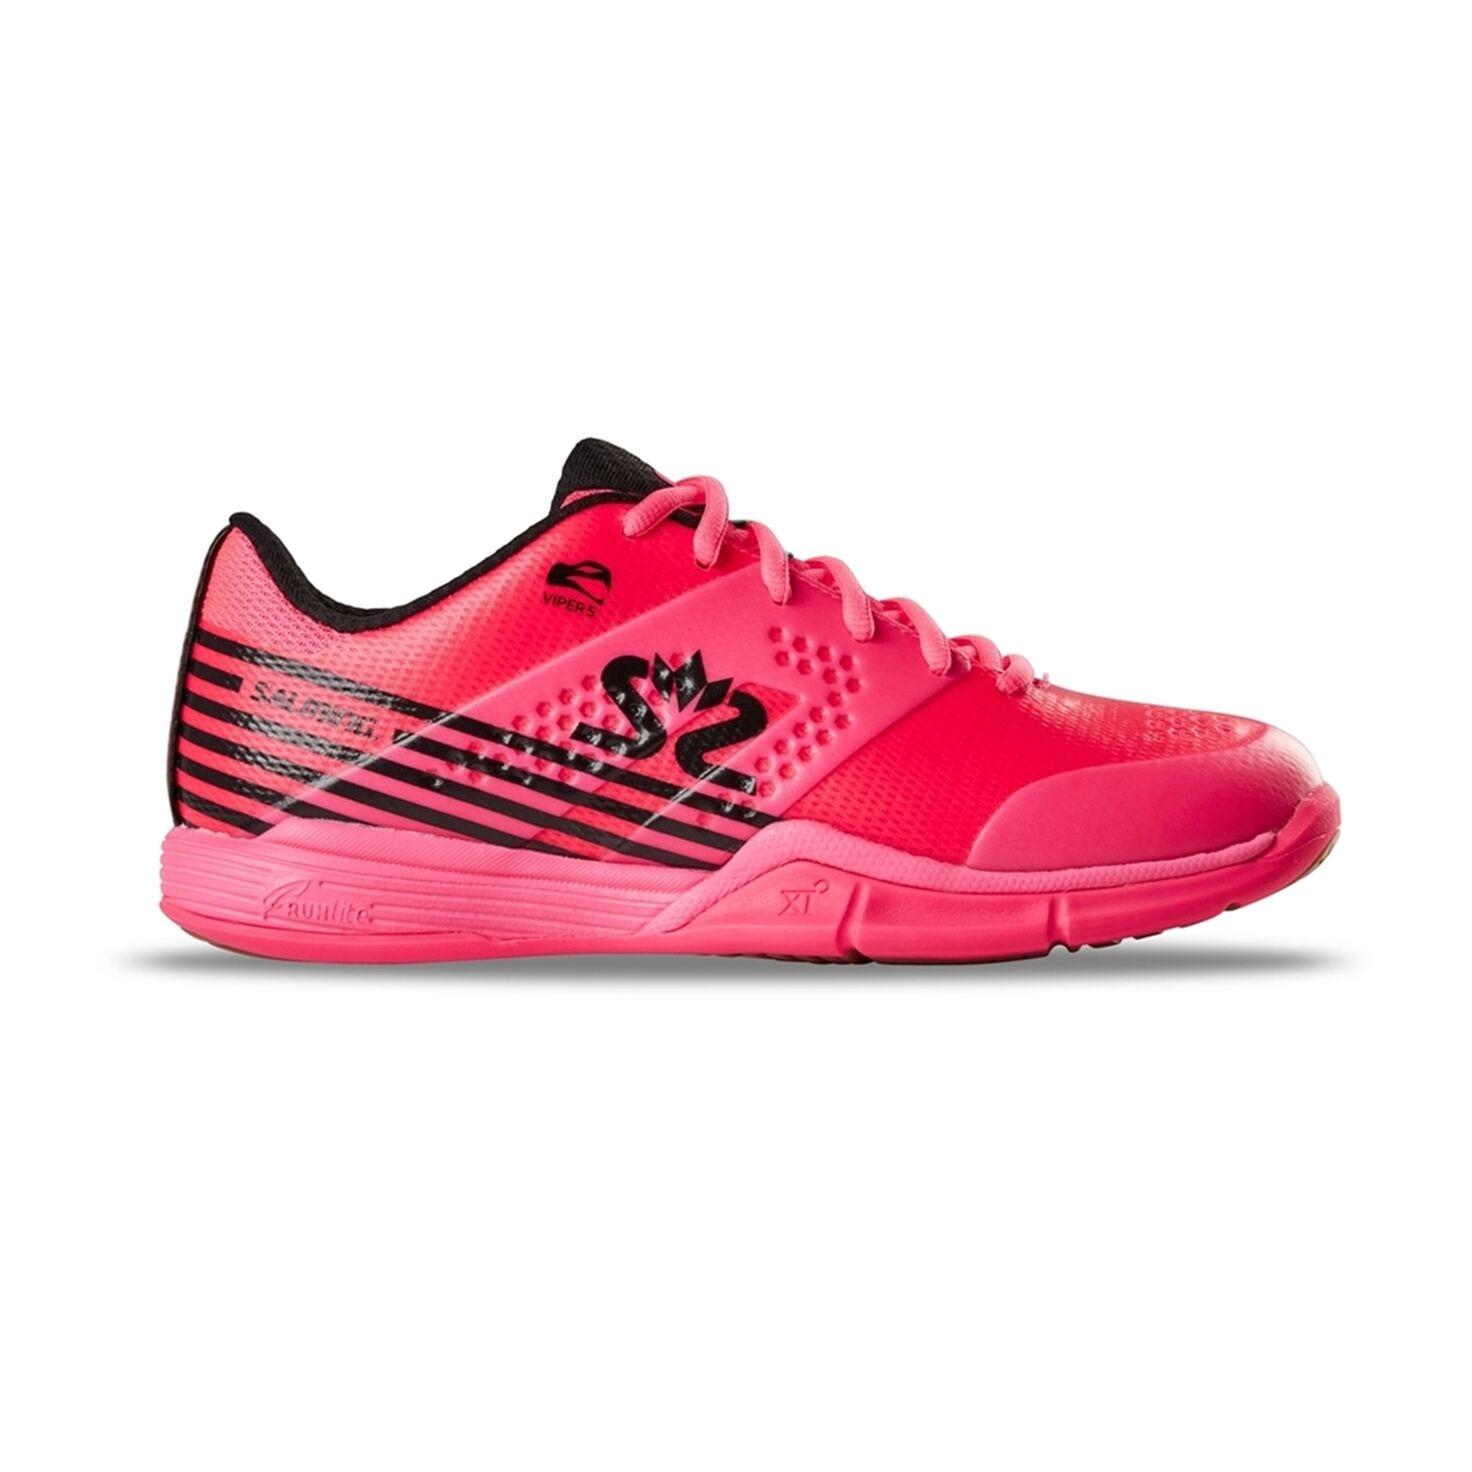 Salming Viper 5 Women Pink/Black 40 2/3